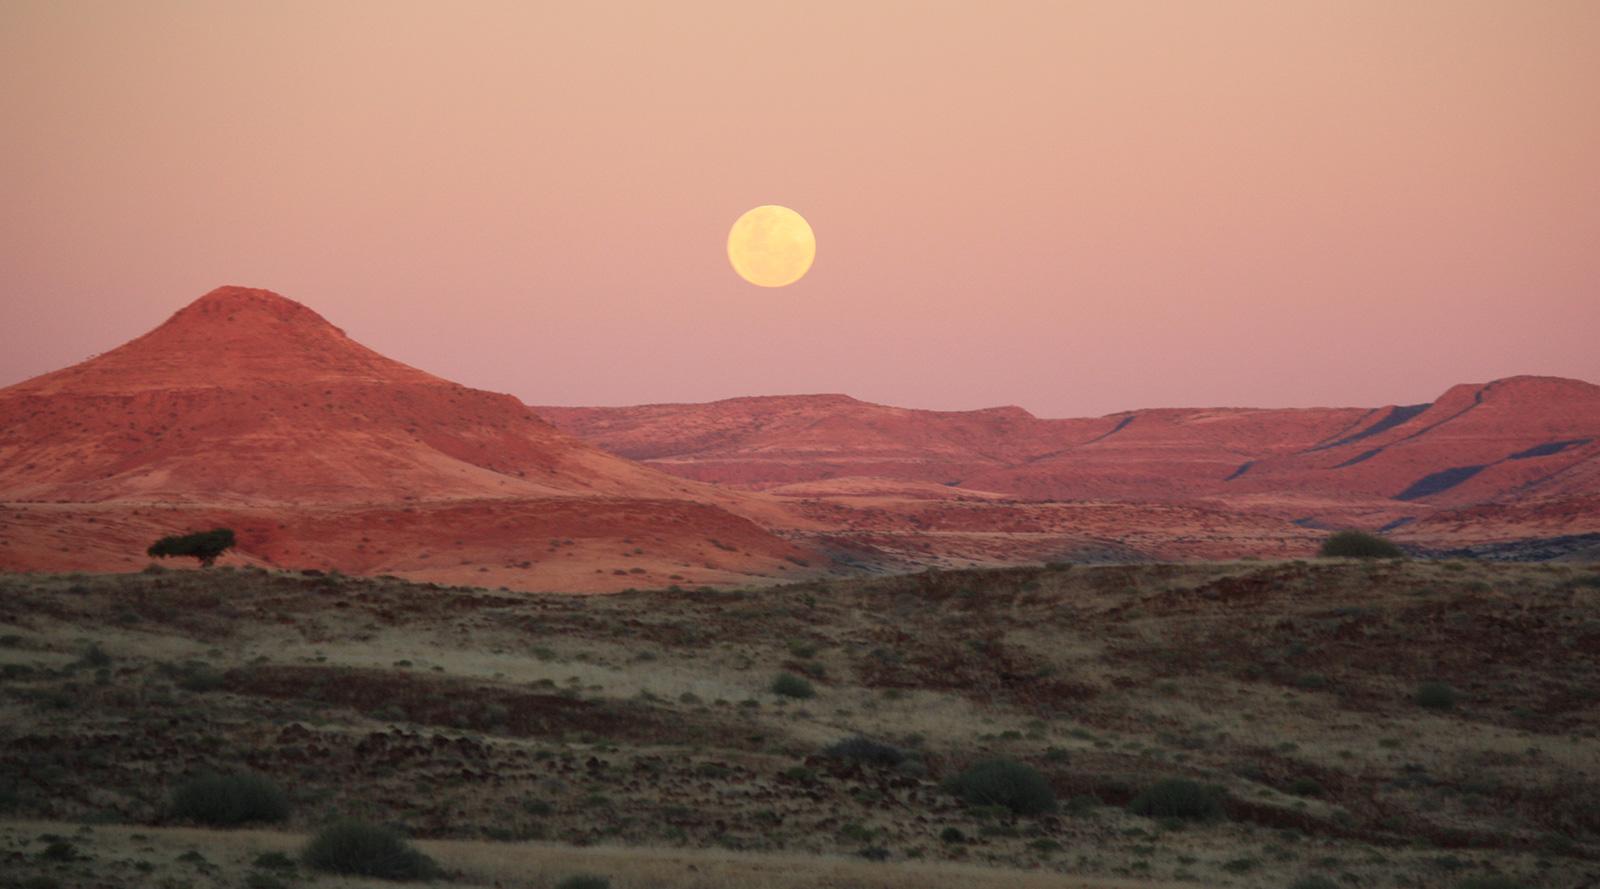 © Benedetta Mazzini | Damaraland, Namibia